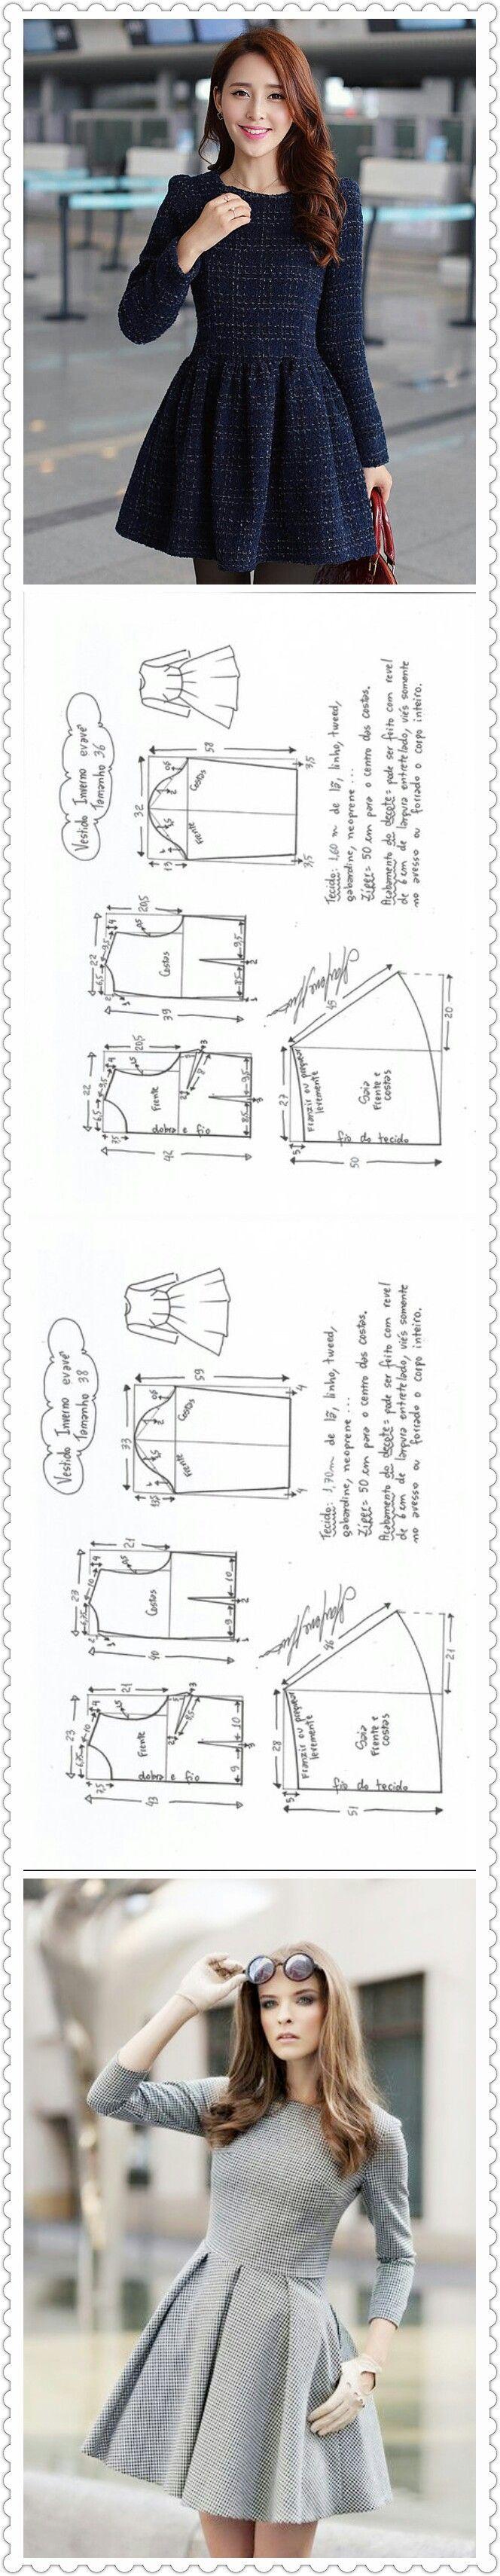 Korean dress | sewing | Pinterest | Costura, Vestidos y Ropa